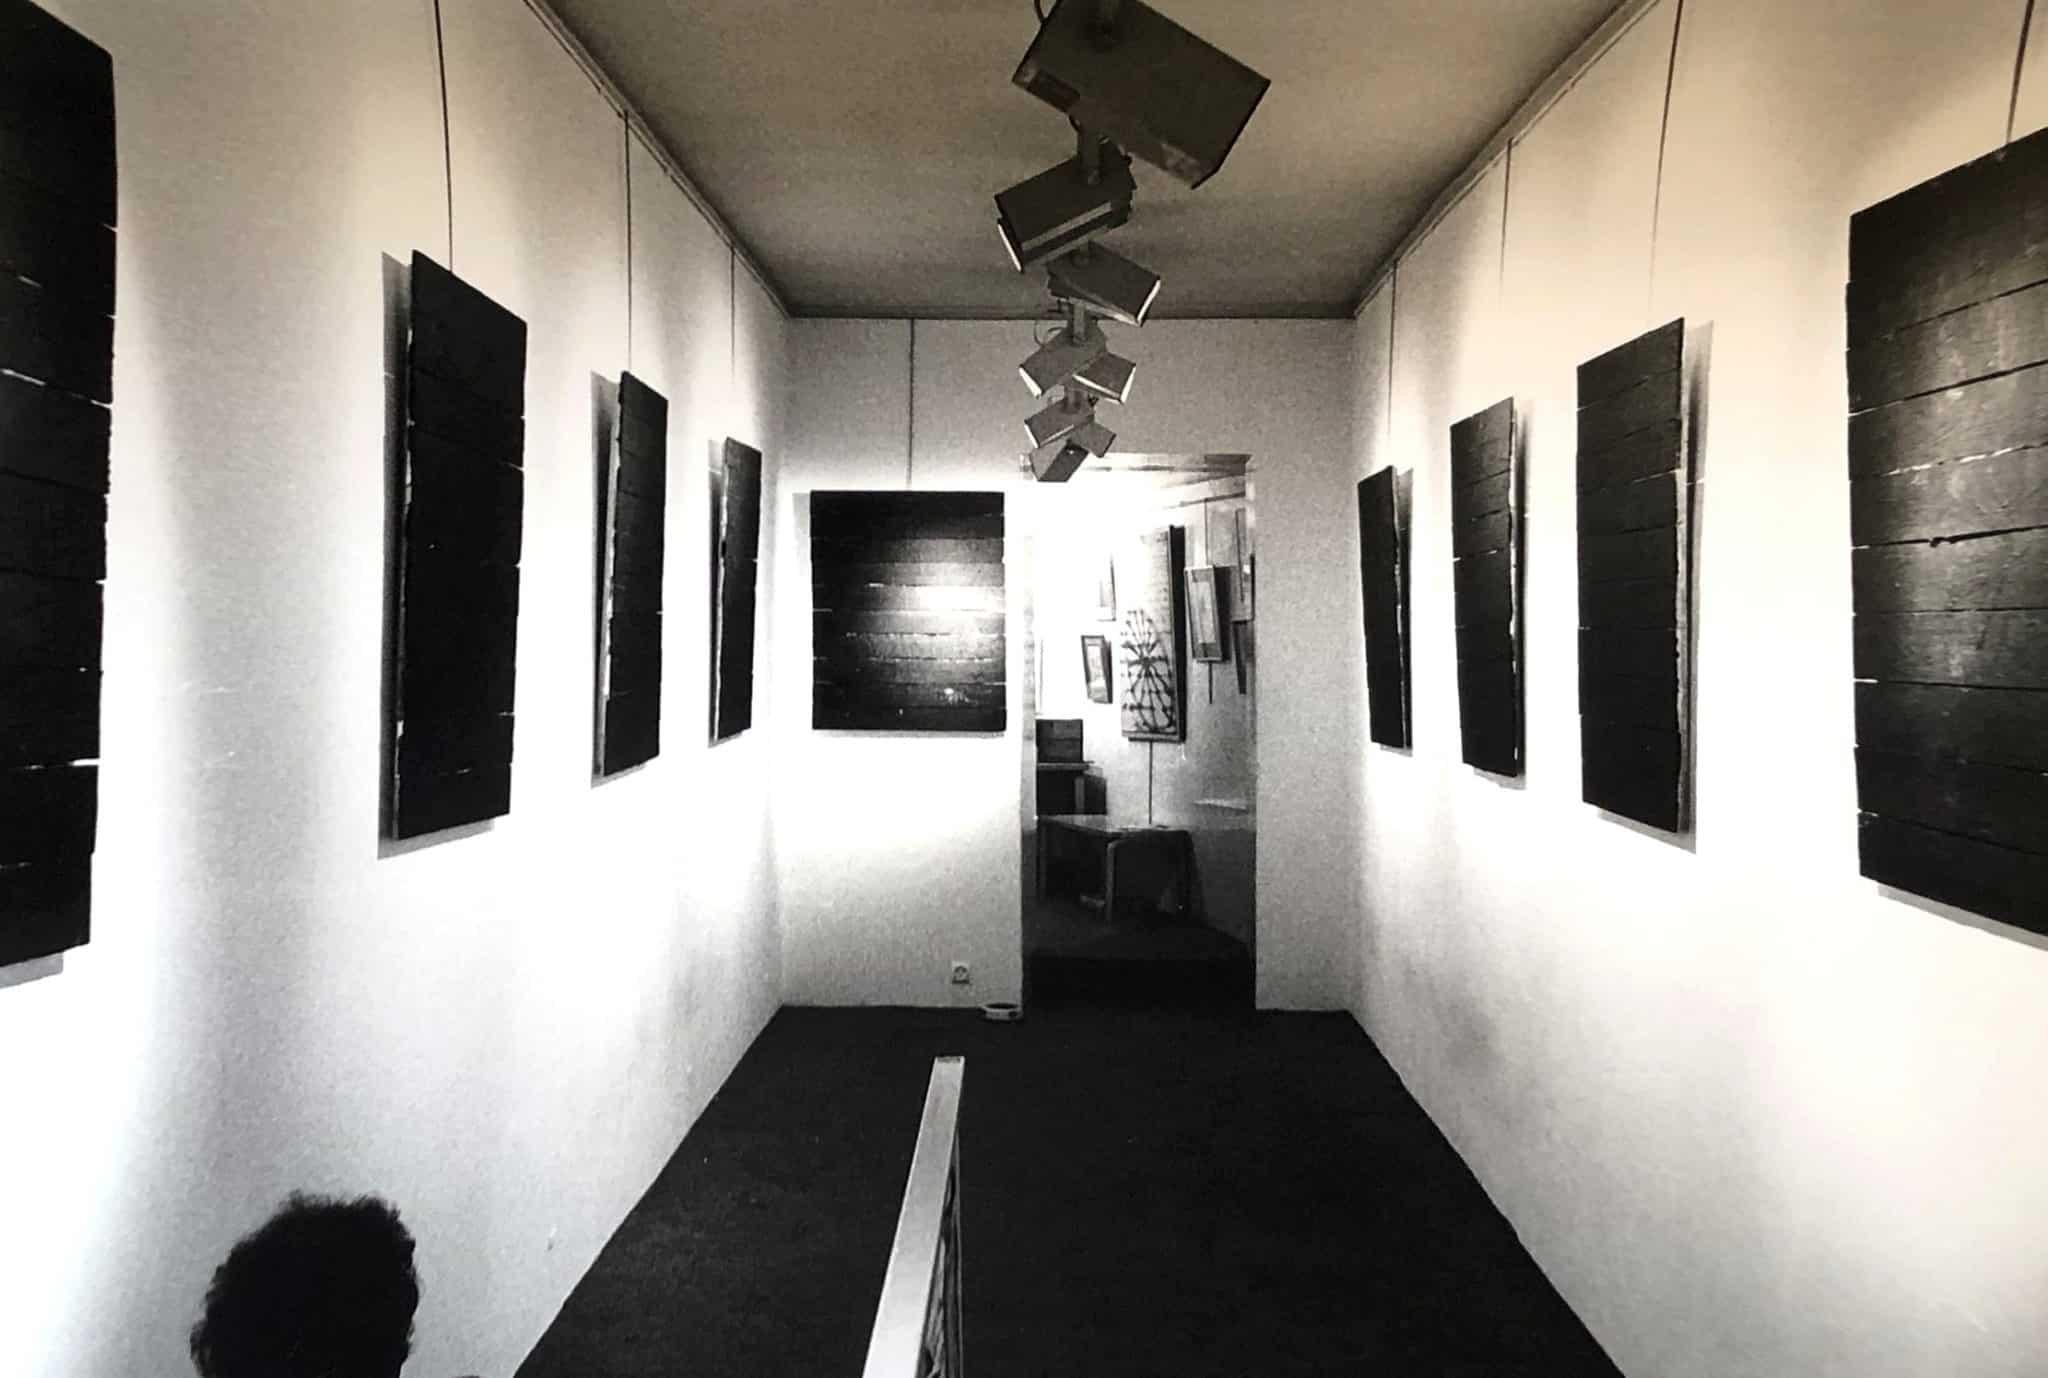 exposition Gérard Zlotykamien